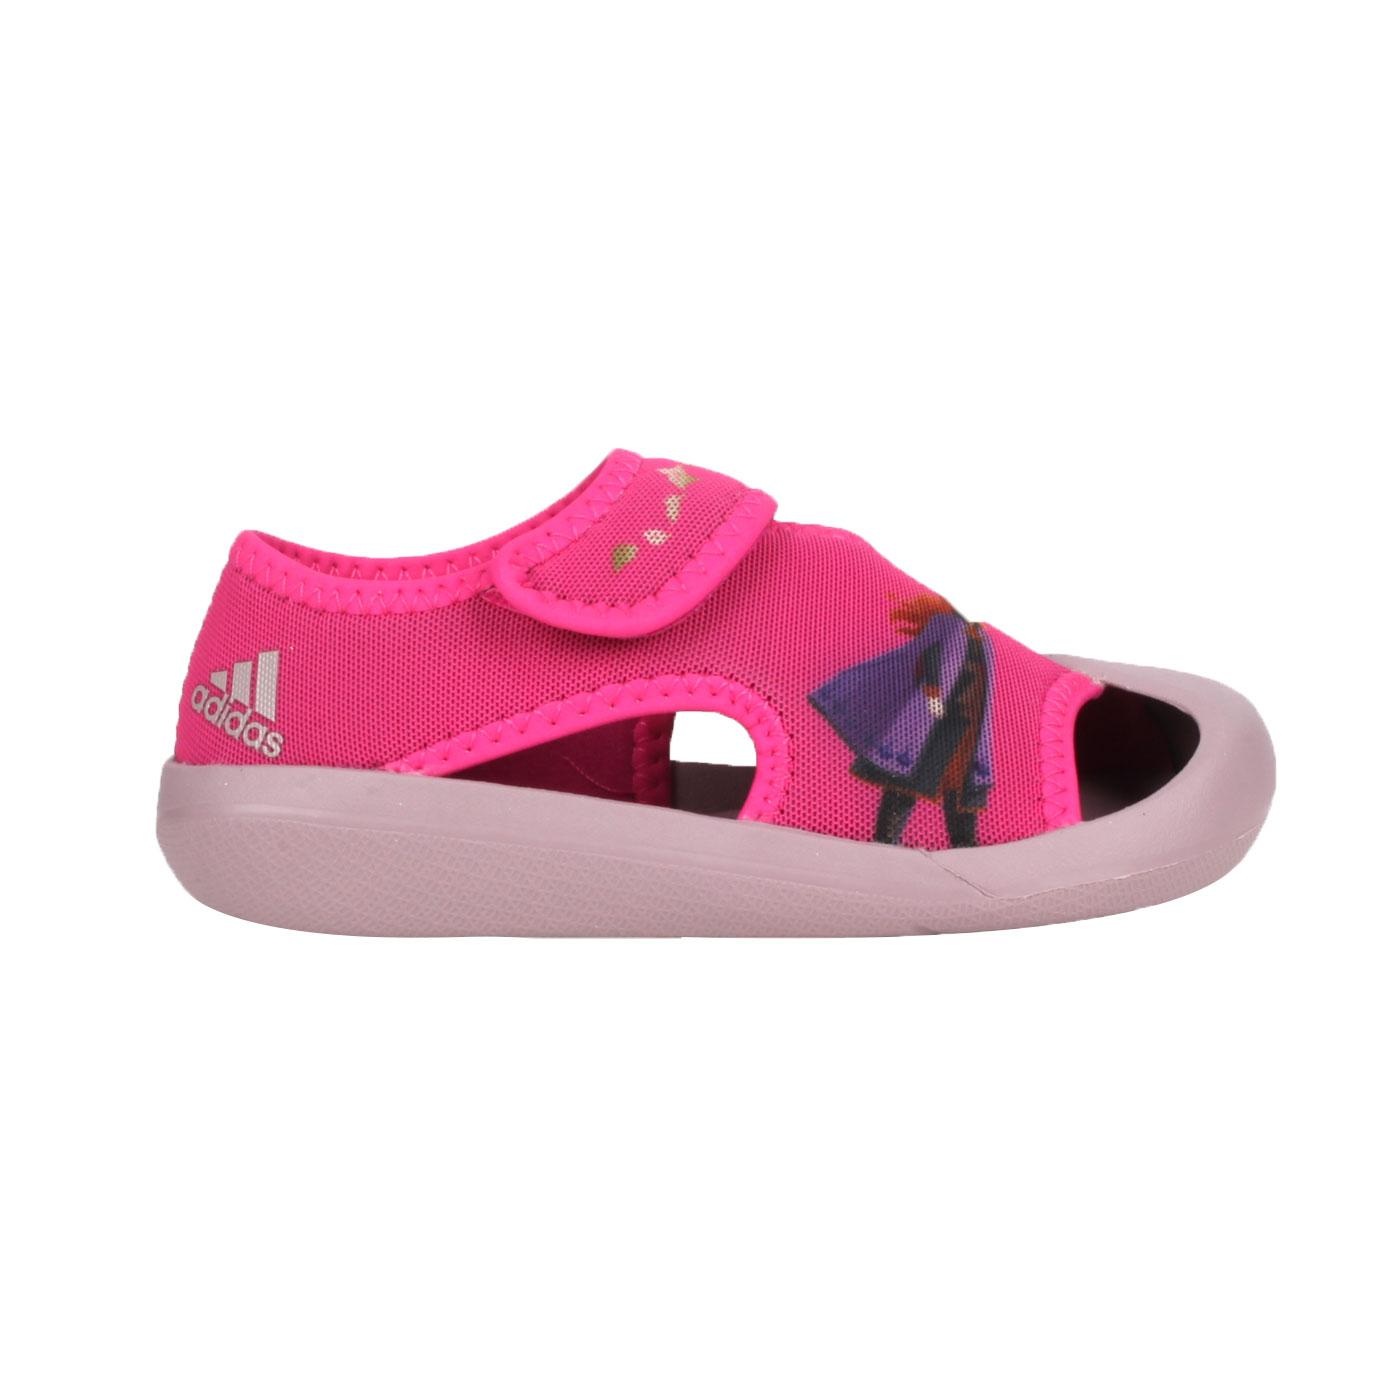 ADIDAS 小童冰雪奇緣涼鞋 FV4652 - 桃紅紫